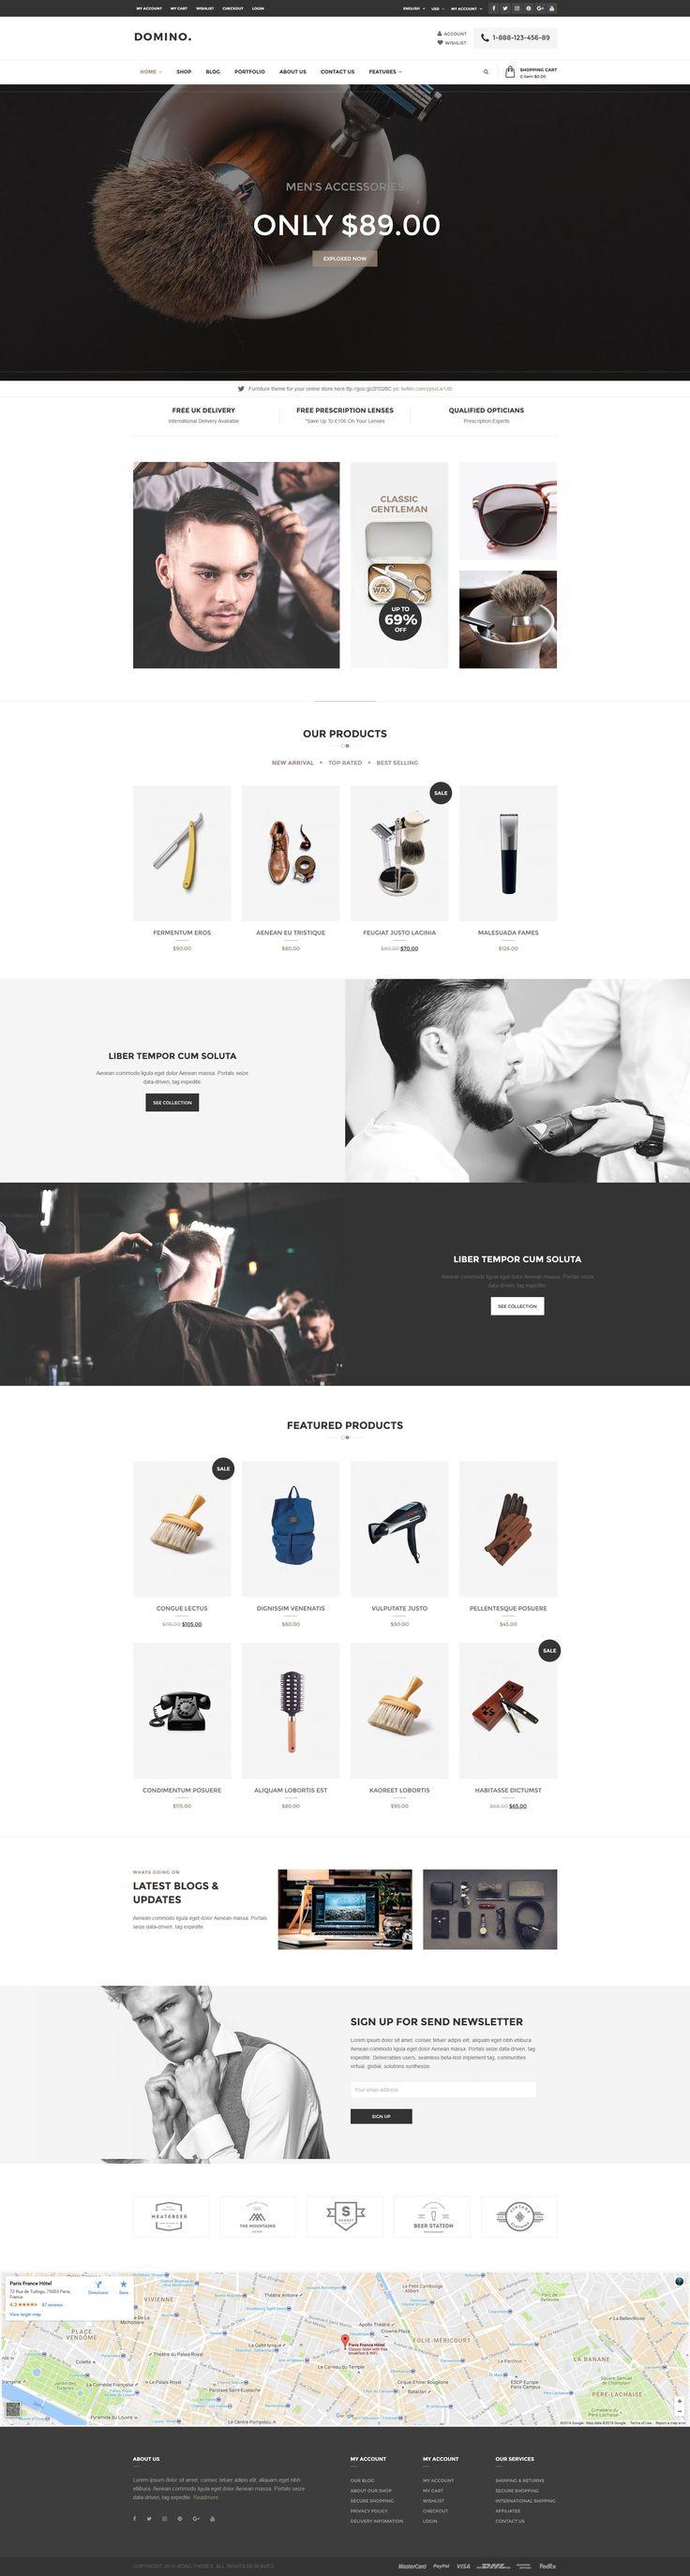 Domino - Fashion Responsive WordPress Theme #wordpress #fashion #mega template • Download ➝ https://themeforest.net/item/domino-fashion-responsive-wordpress-theme/17908571?ref=pxcr